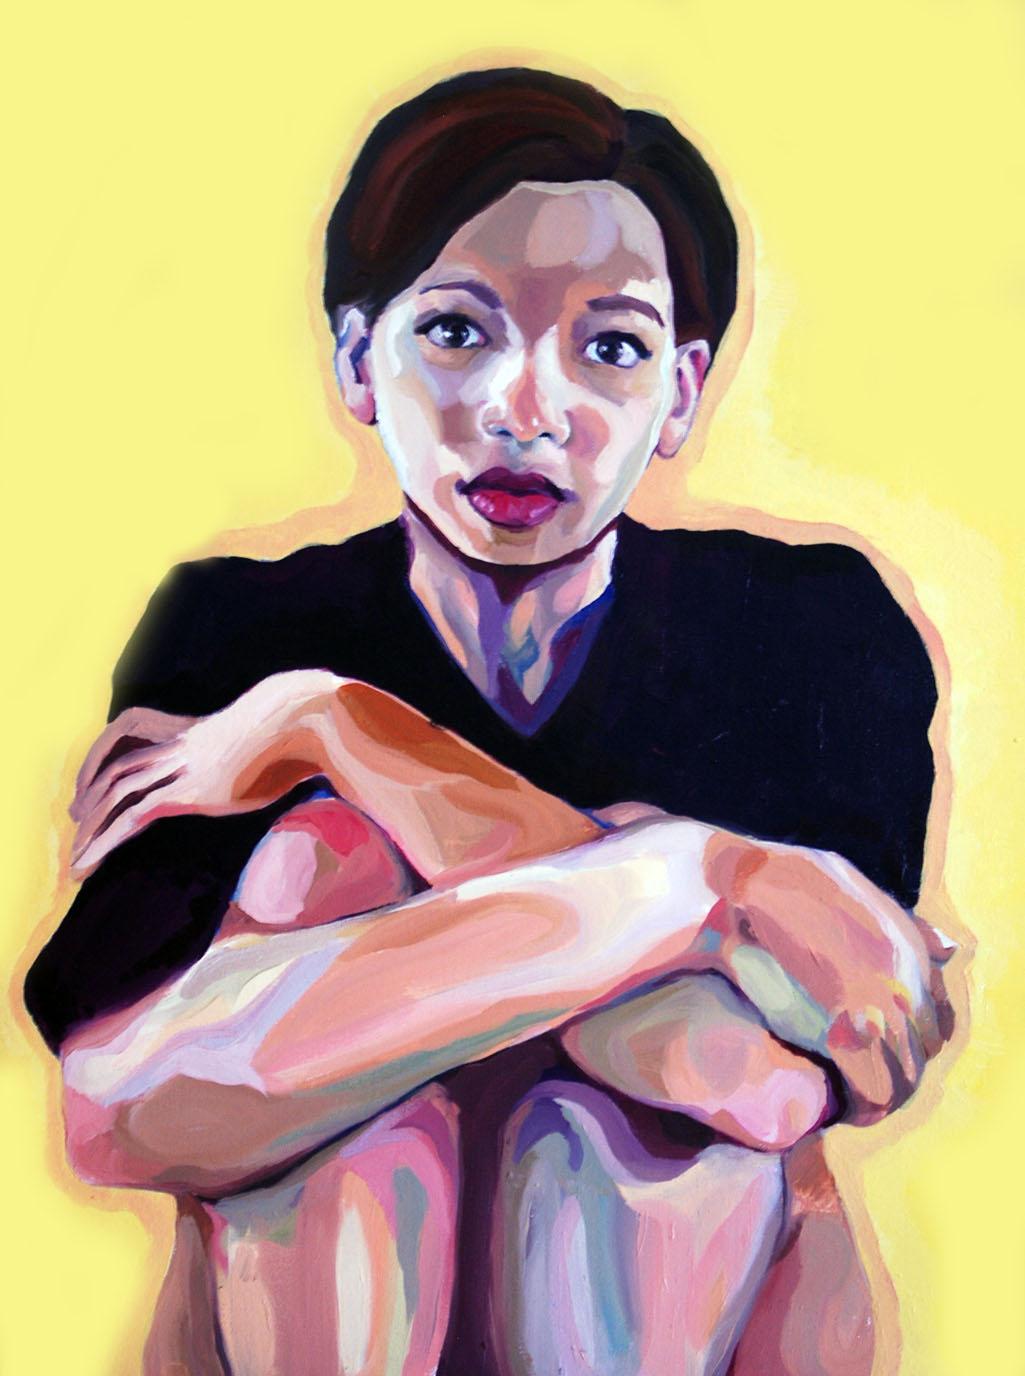 """Yellow"" by Sendra Uebele"